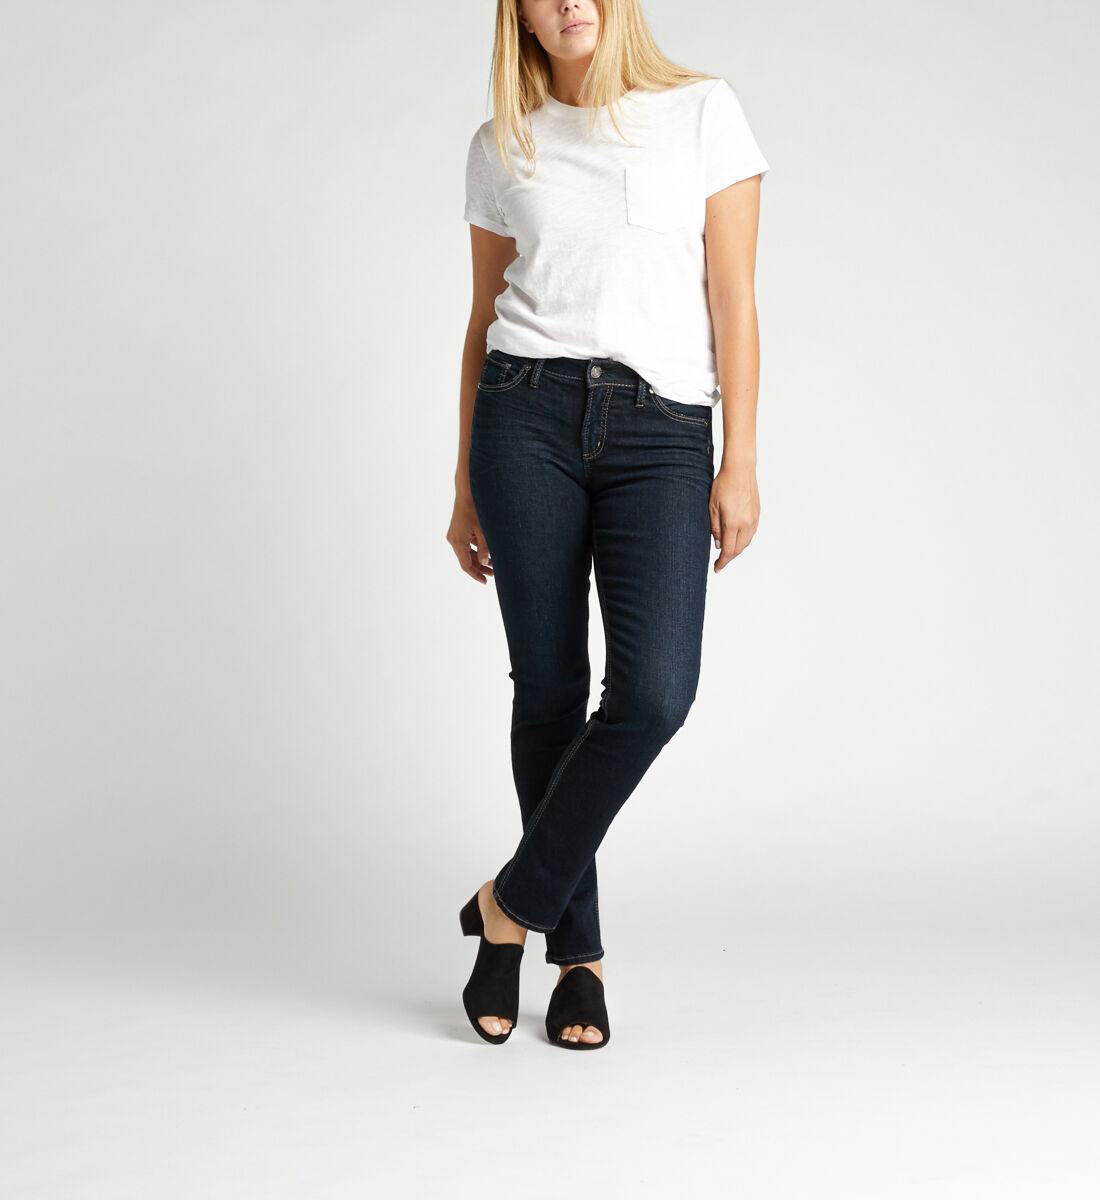 Avery High Rise Straight Leg Jeans Alt Image 1